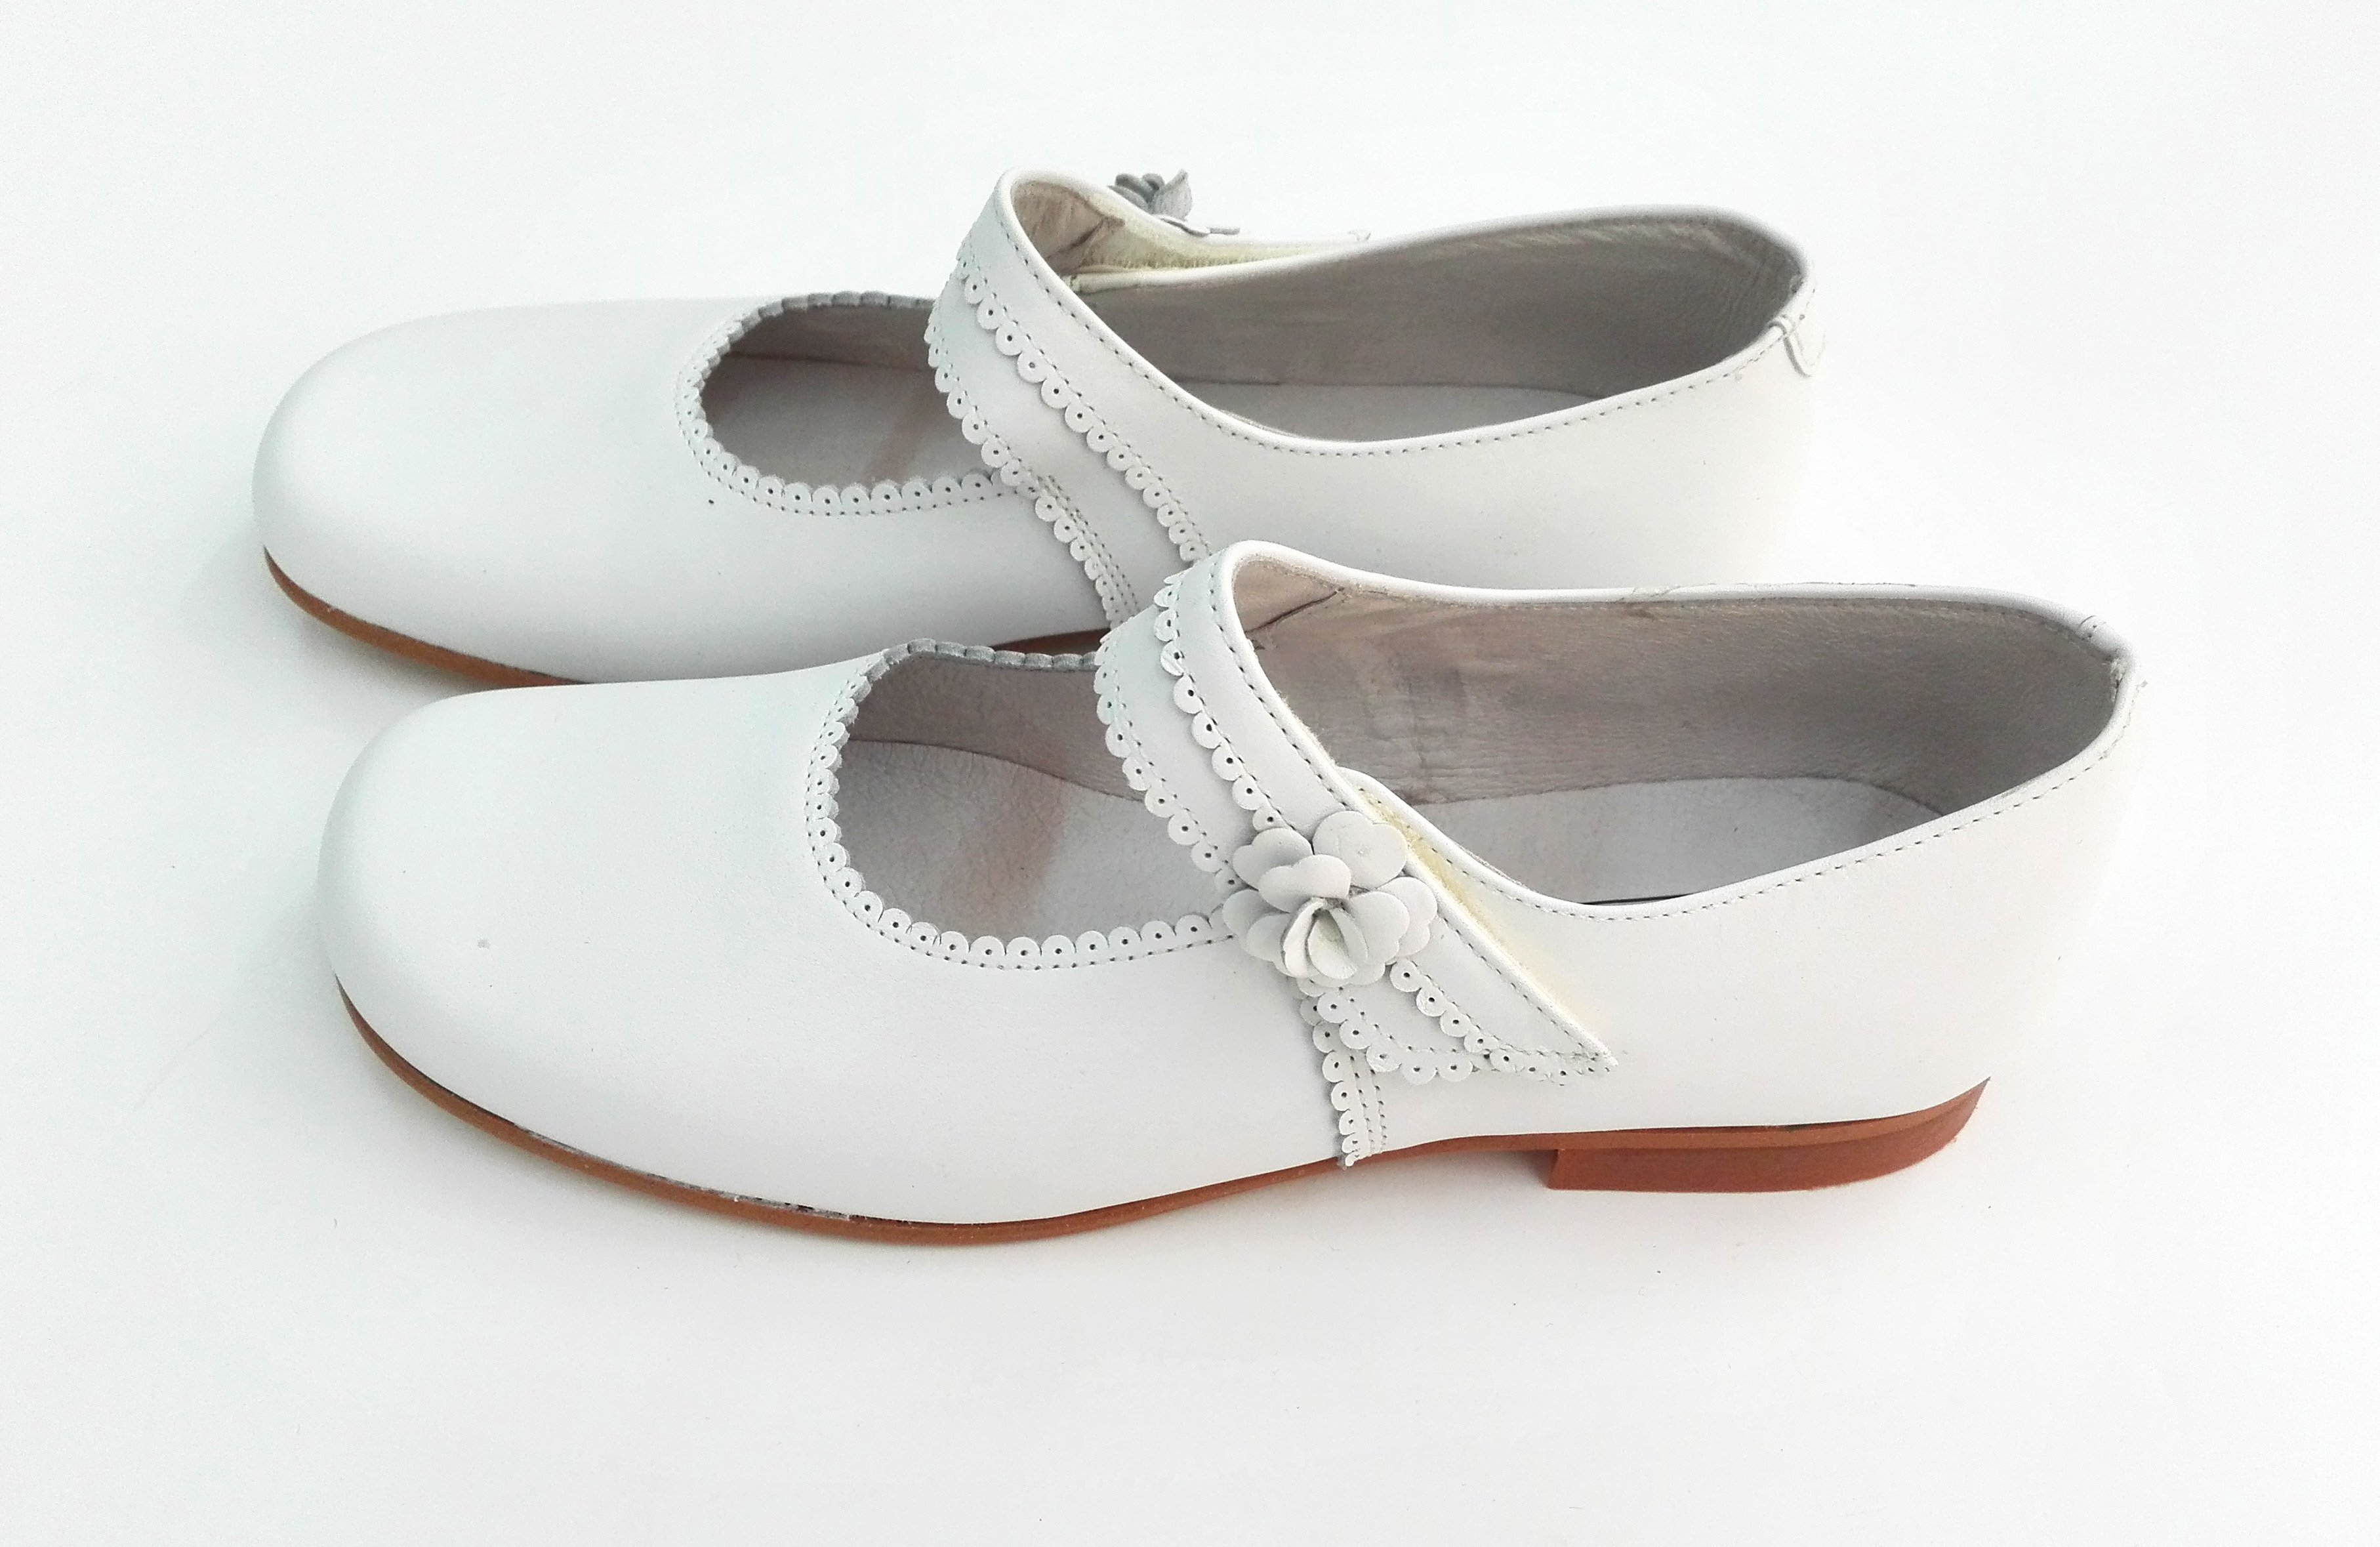 b49e82cb Zapato niña PIEL BLANCO - Arca Boutique Infantil-Juvenil